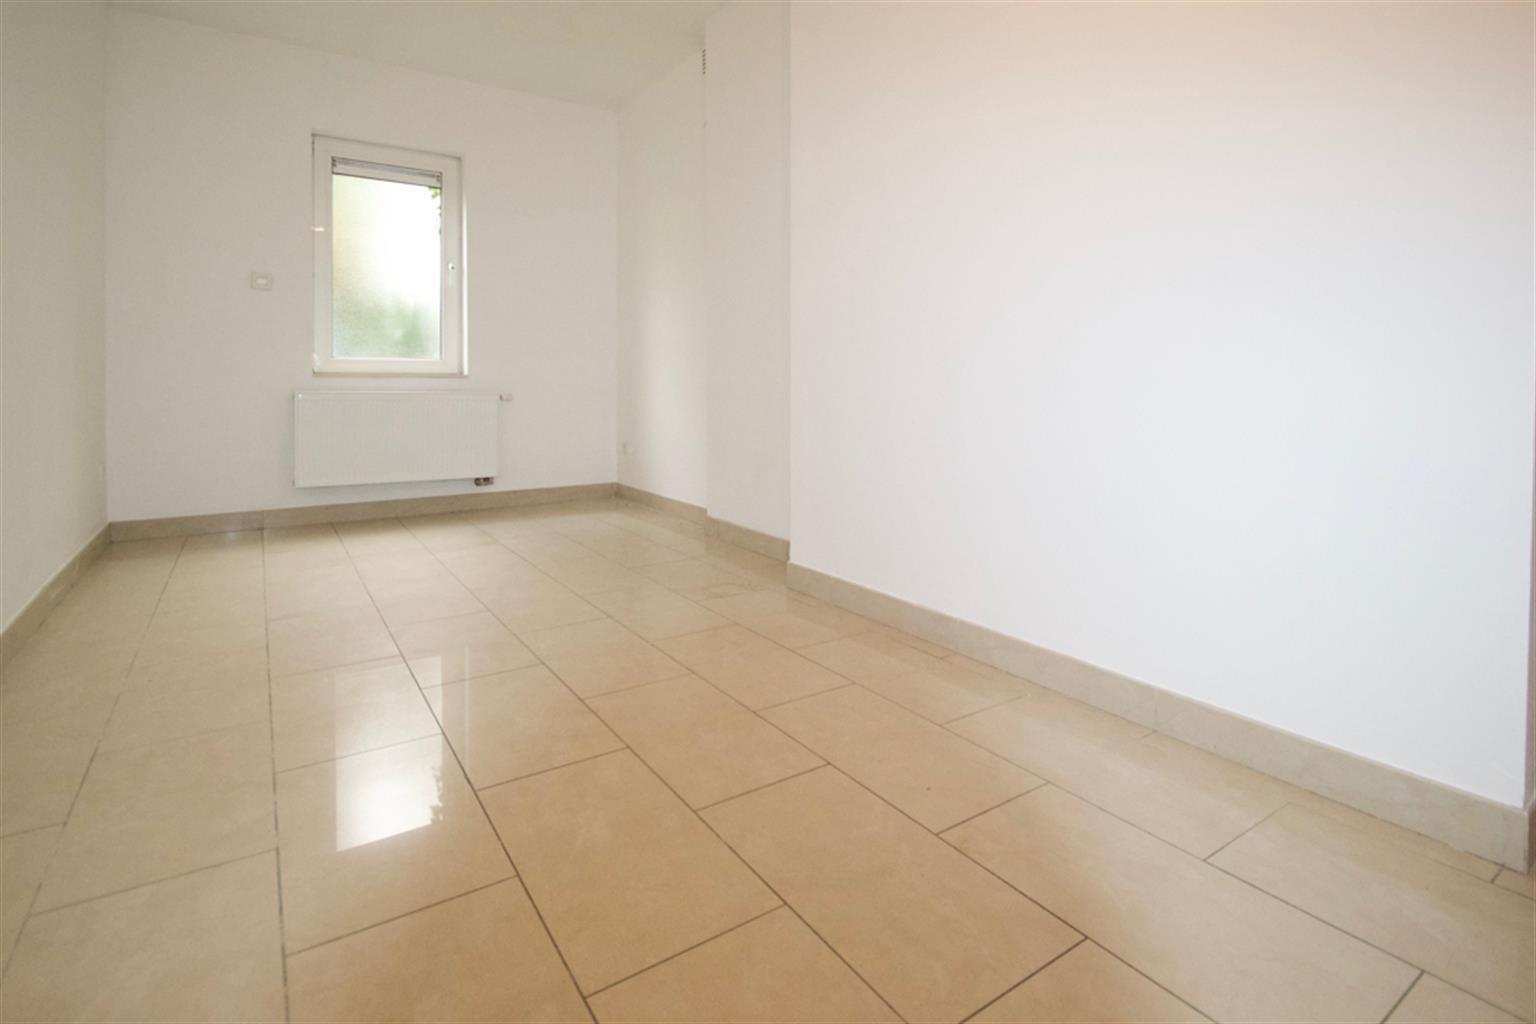 Appartement - Binche Leval-Trahegnies - #3734770-5